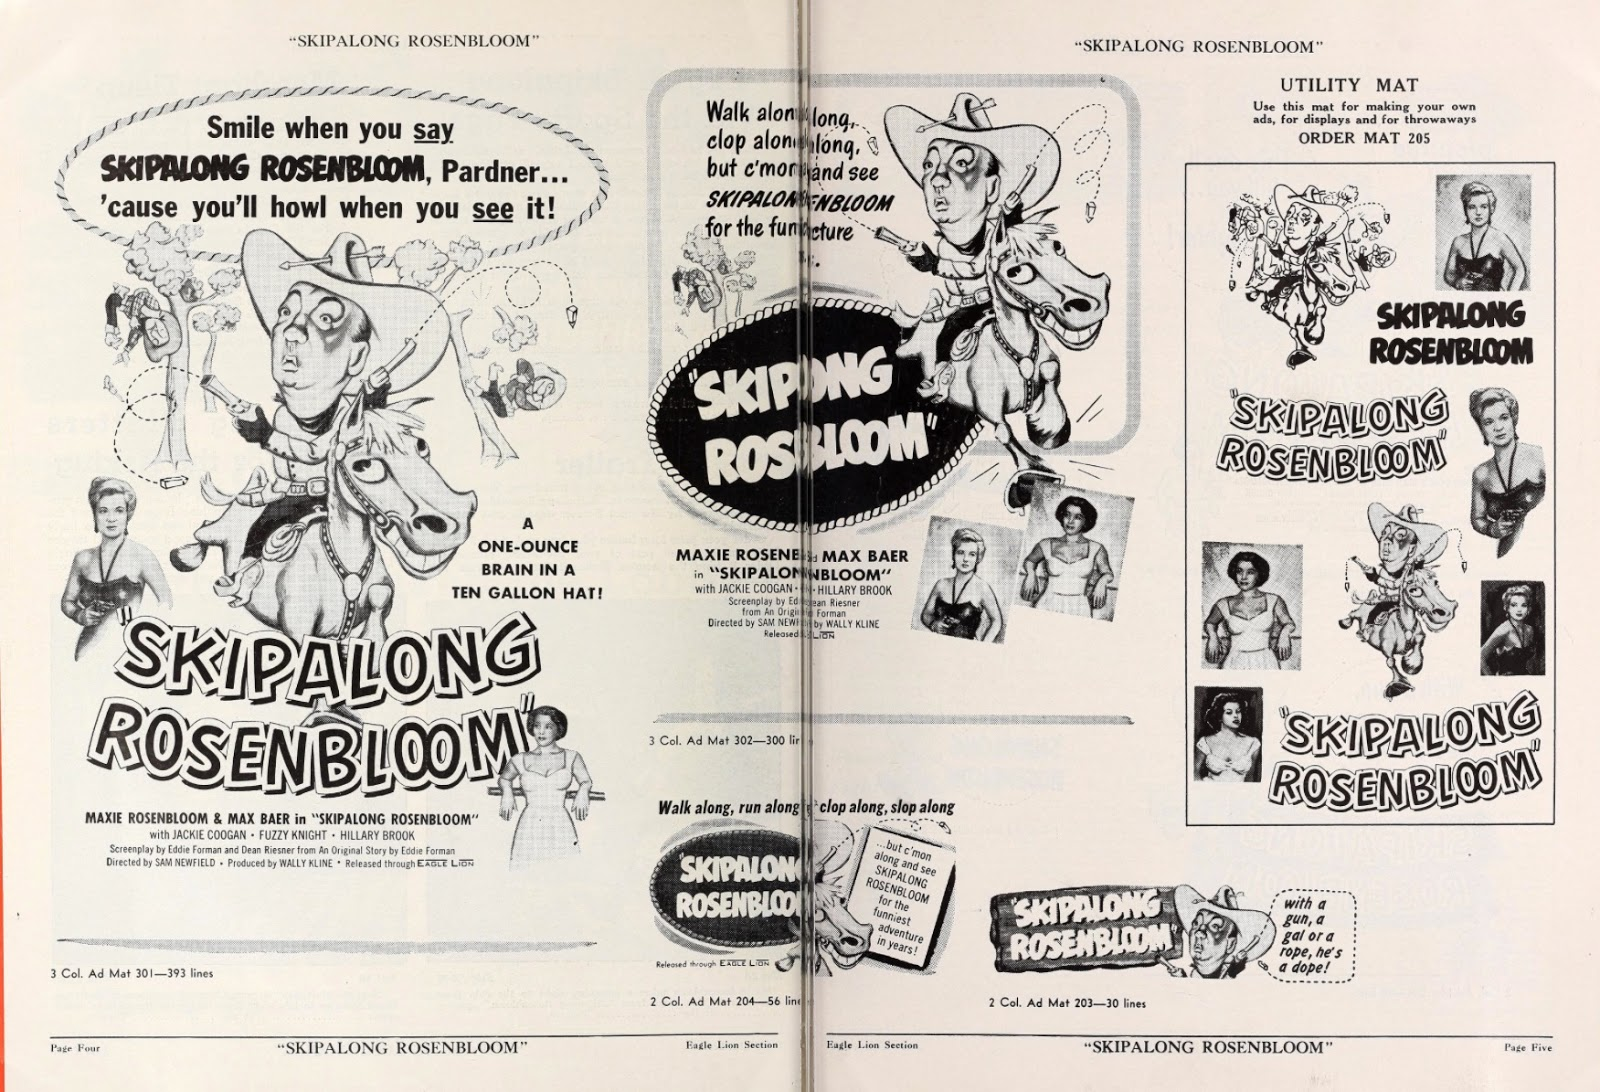 Skipalong Rosenbloom Press Packet